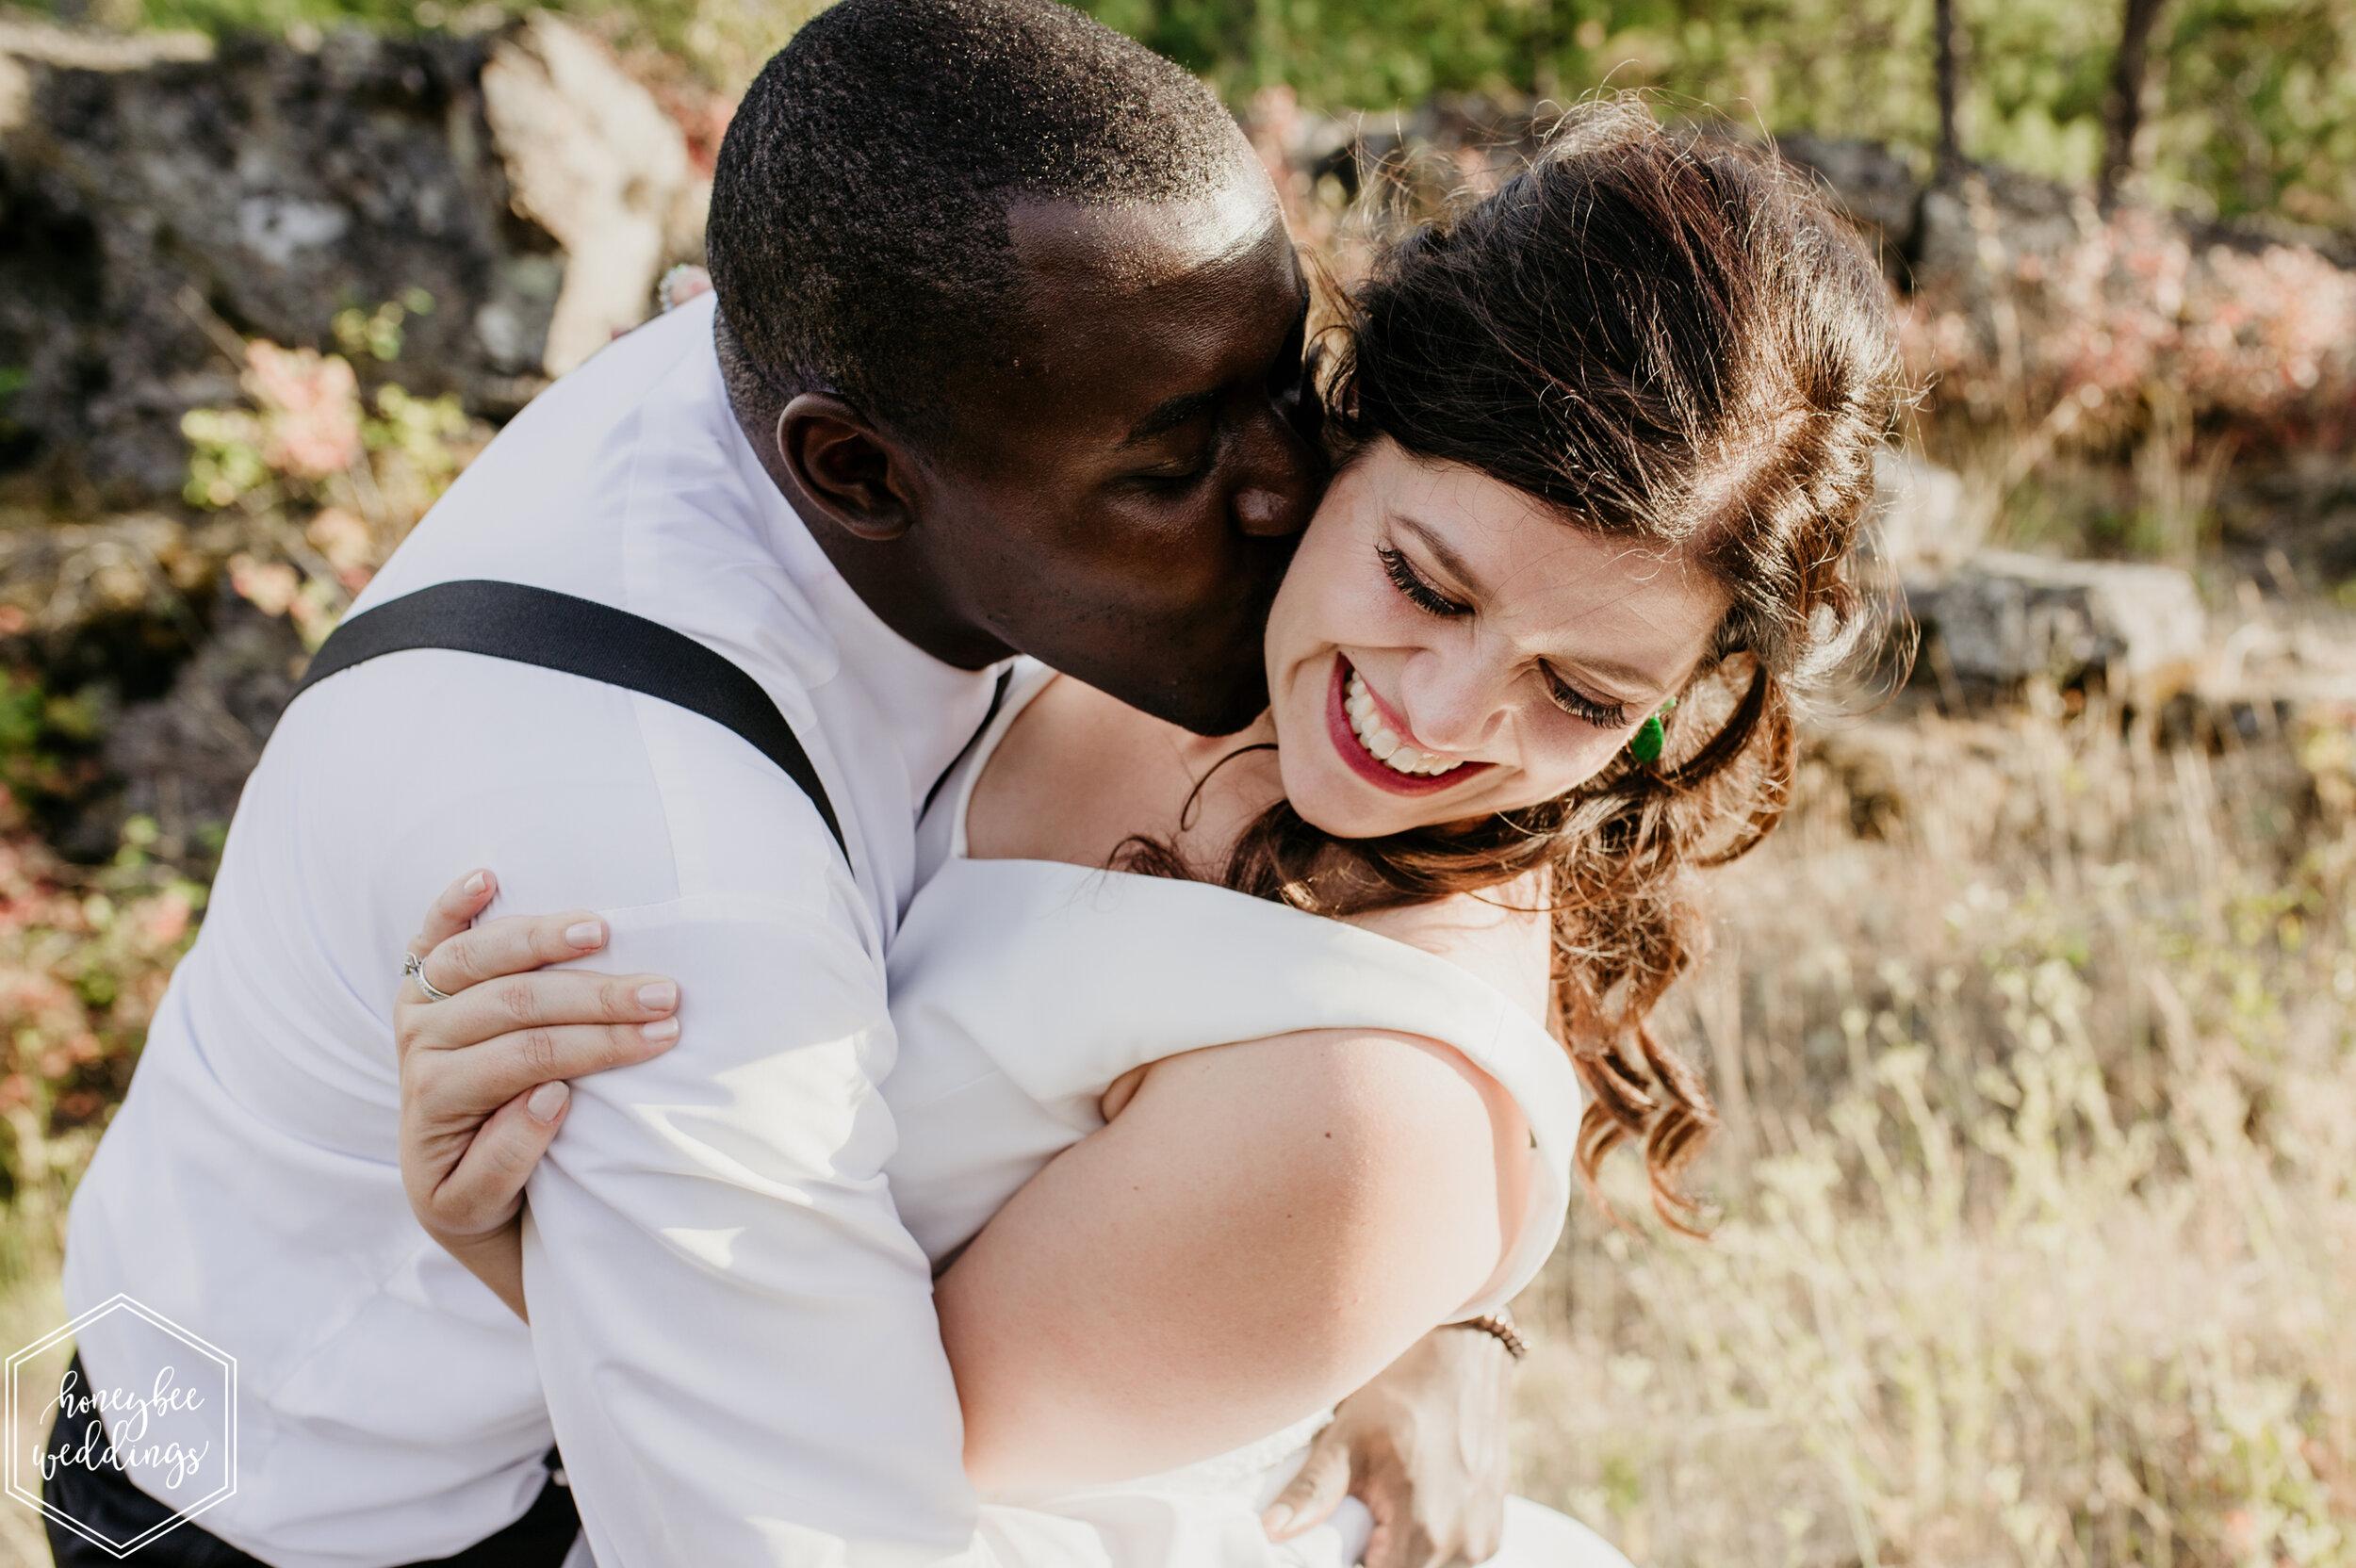 003White Raven Wedding_Montana Wedding Photographer_Rebekah & Likom_July 27, 2019-3.jpg